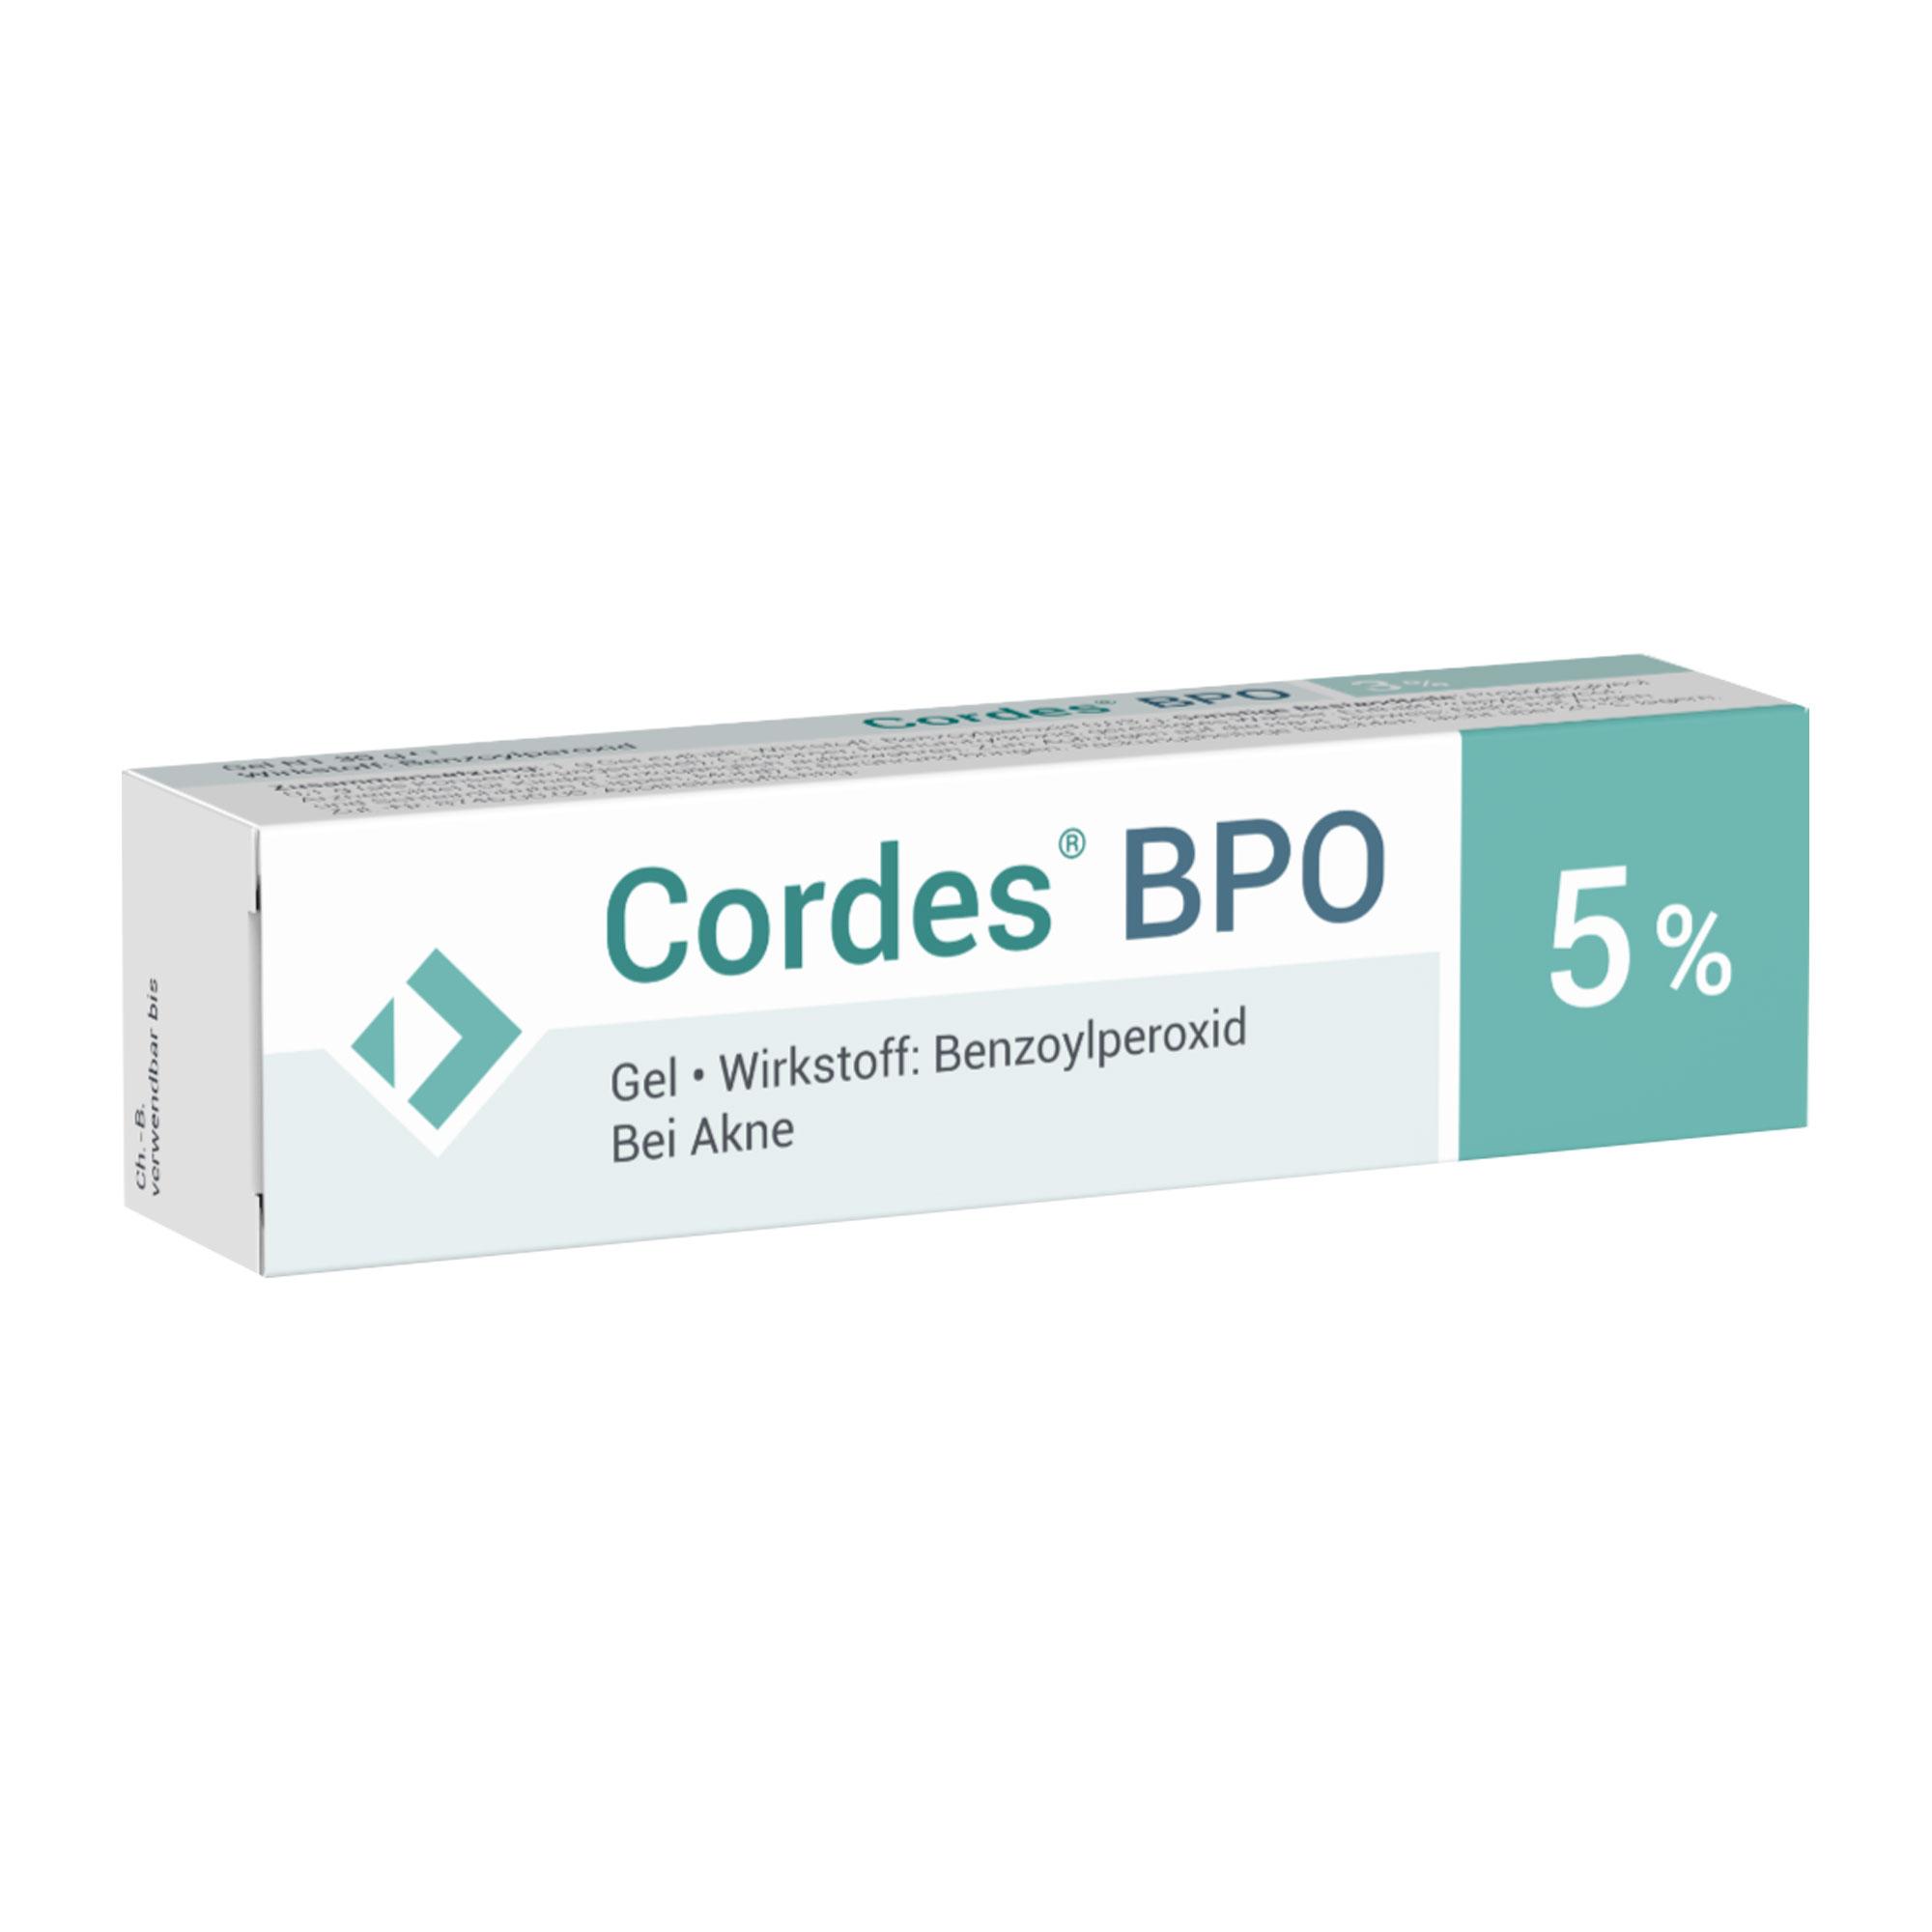 Cordes BPO 5 % Gel